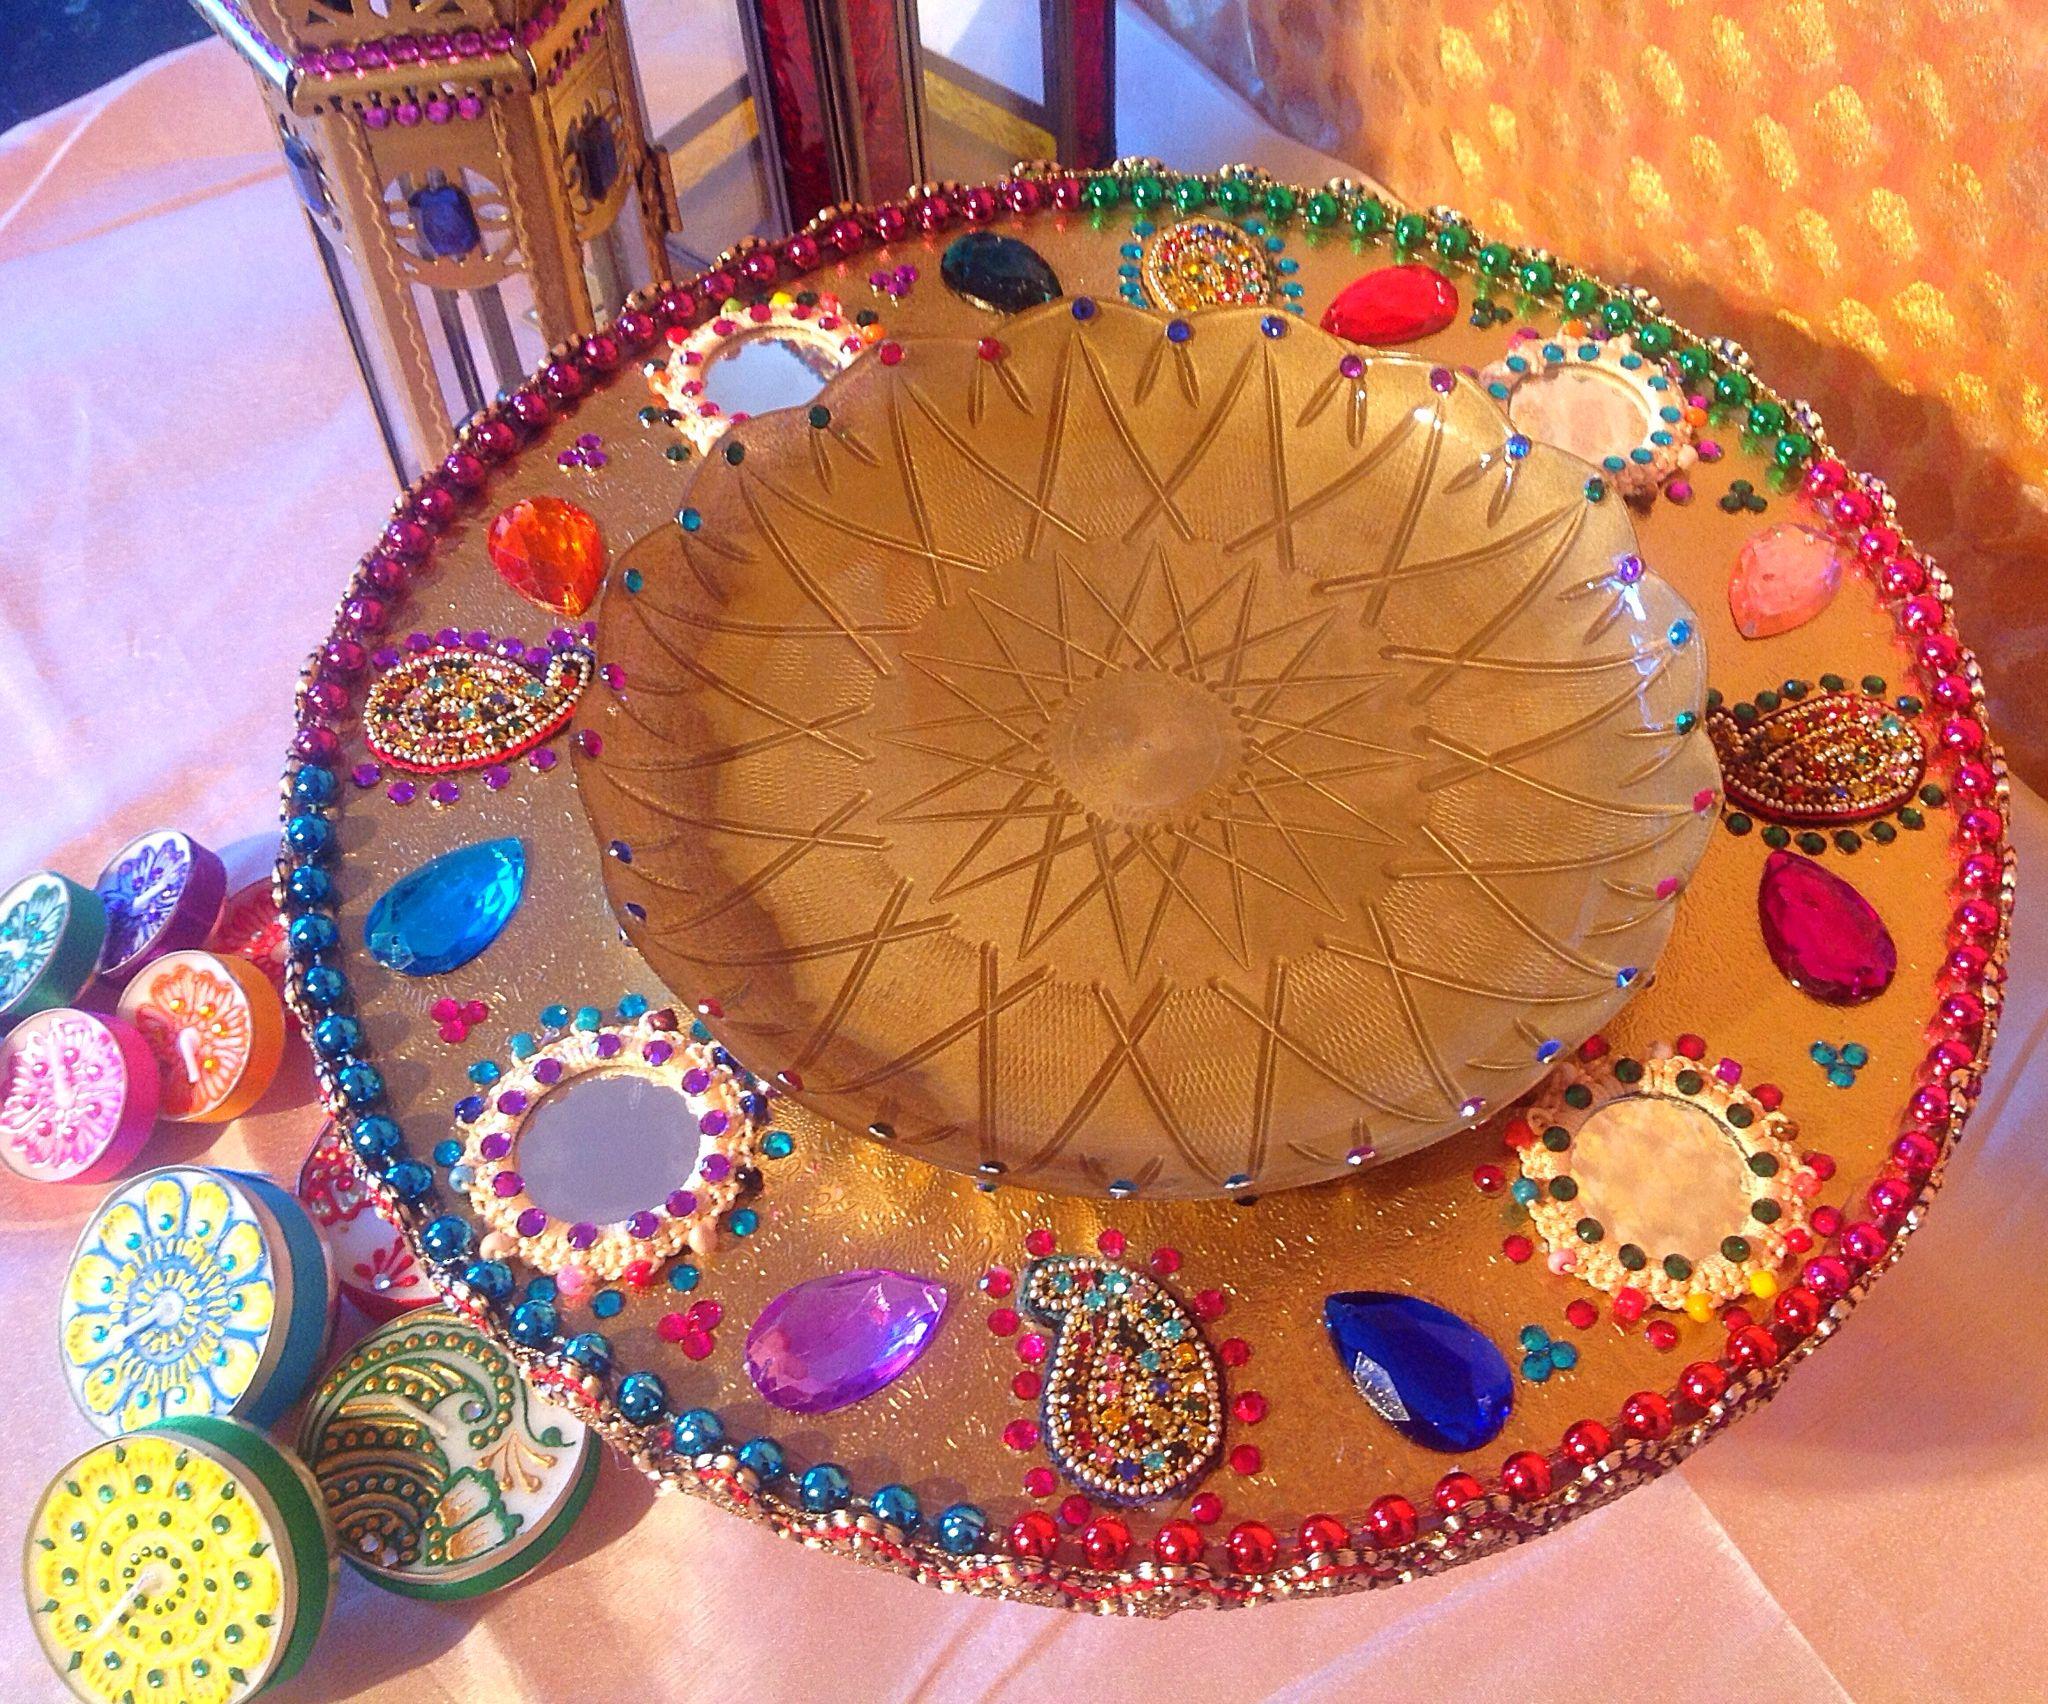 Diy Mehndi Plates : A beautiful sweet mitai mehndi plate love the multi colours see